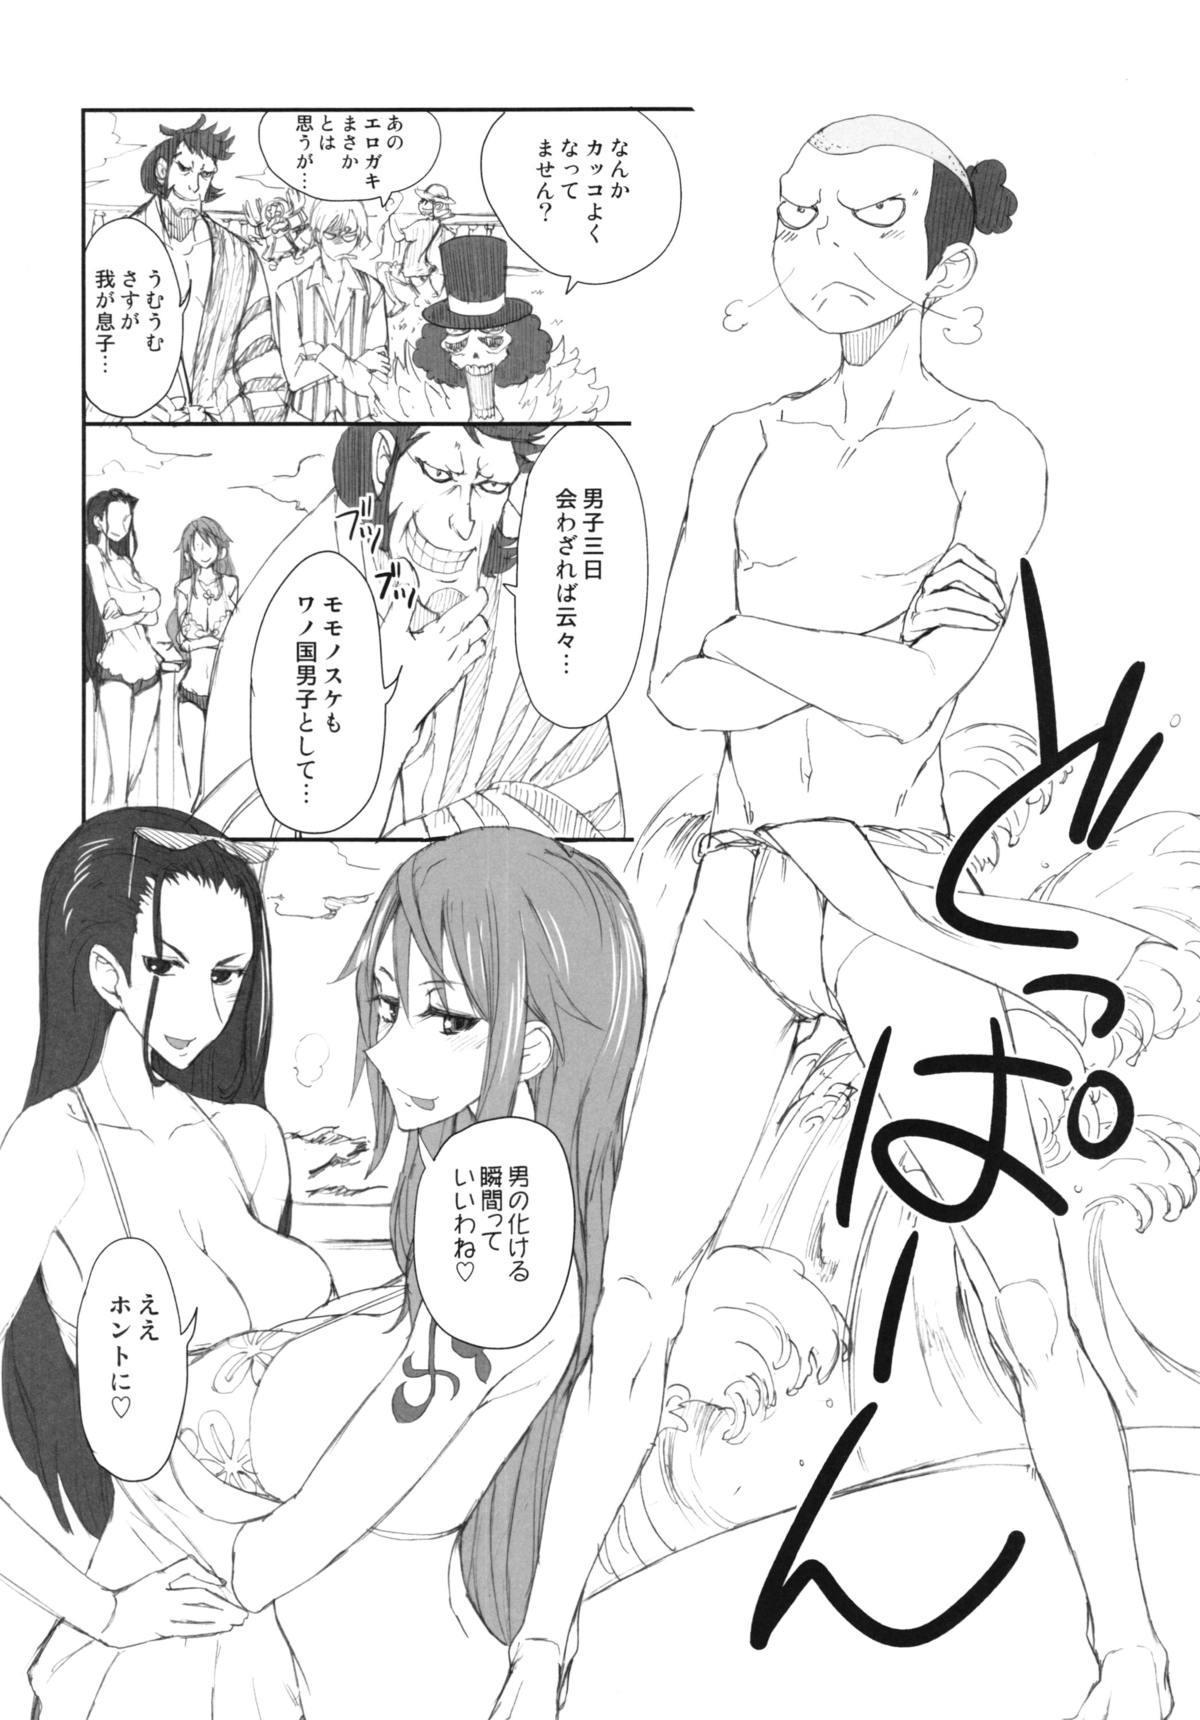 Grandline Chronicle 3 Momo ☆ Momo 23